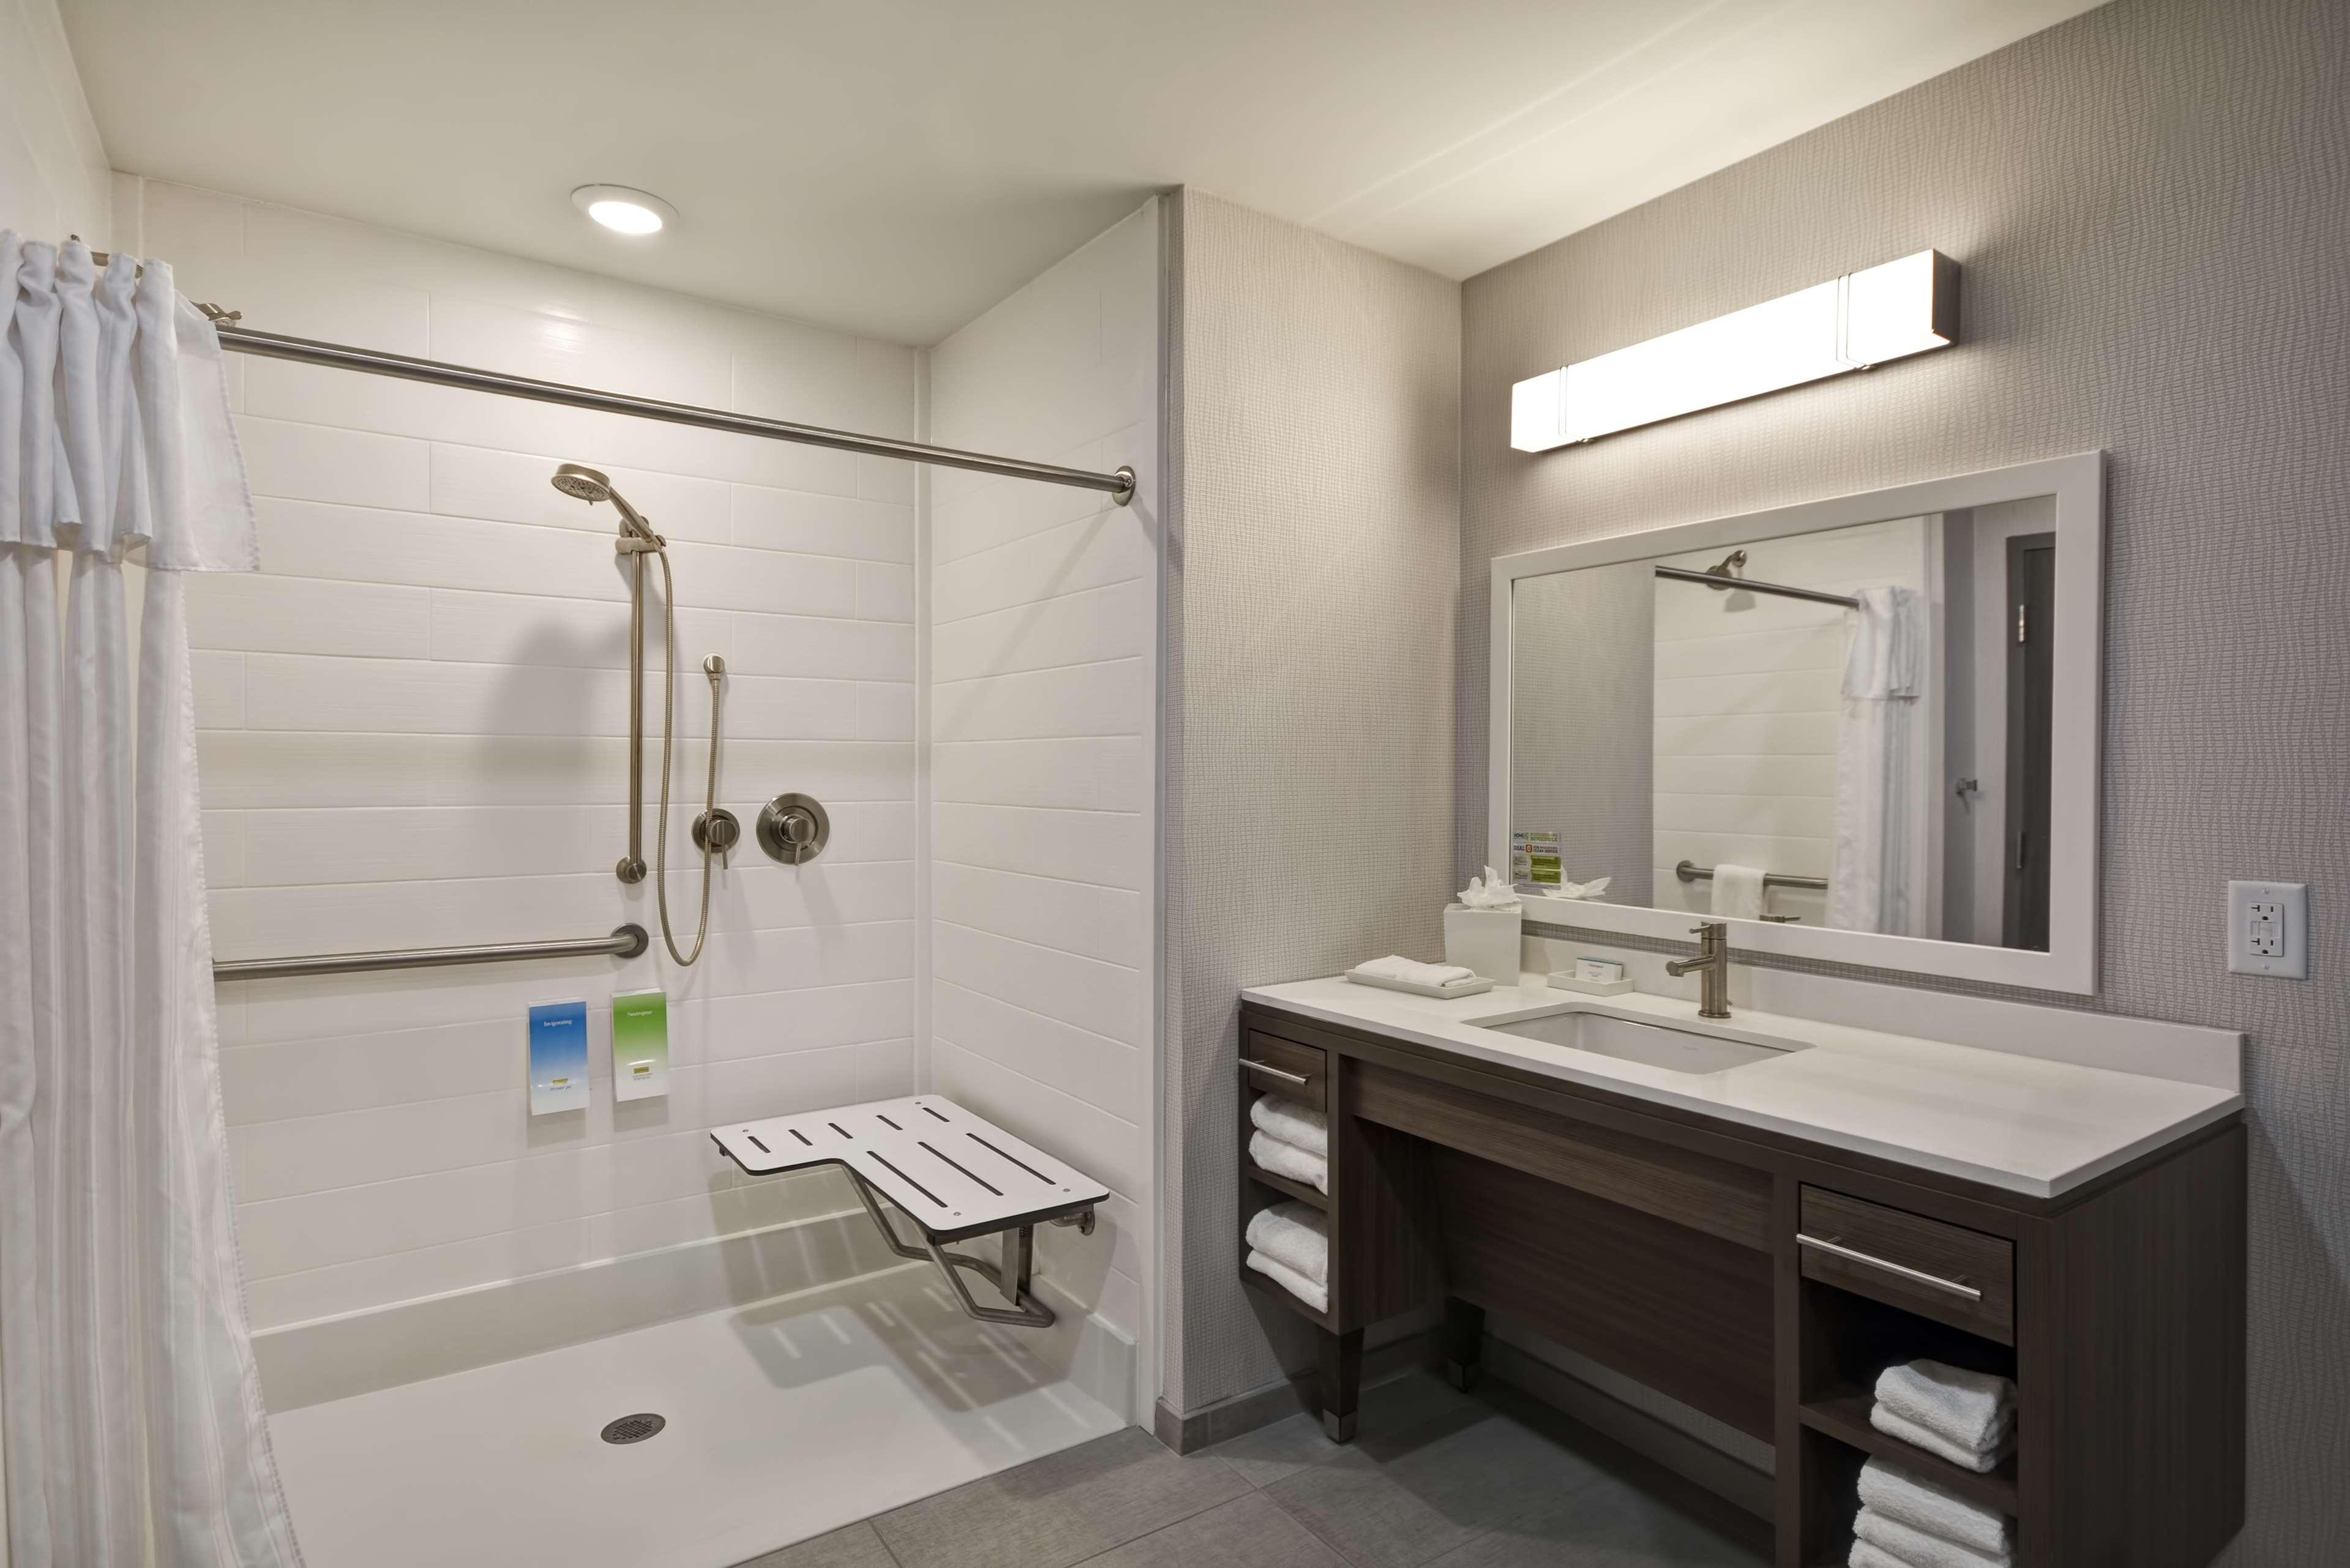 Home2 Suites by Hilton Atlanta West Lithia Springs image 33